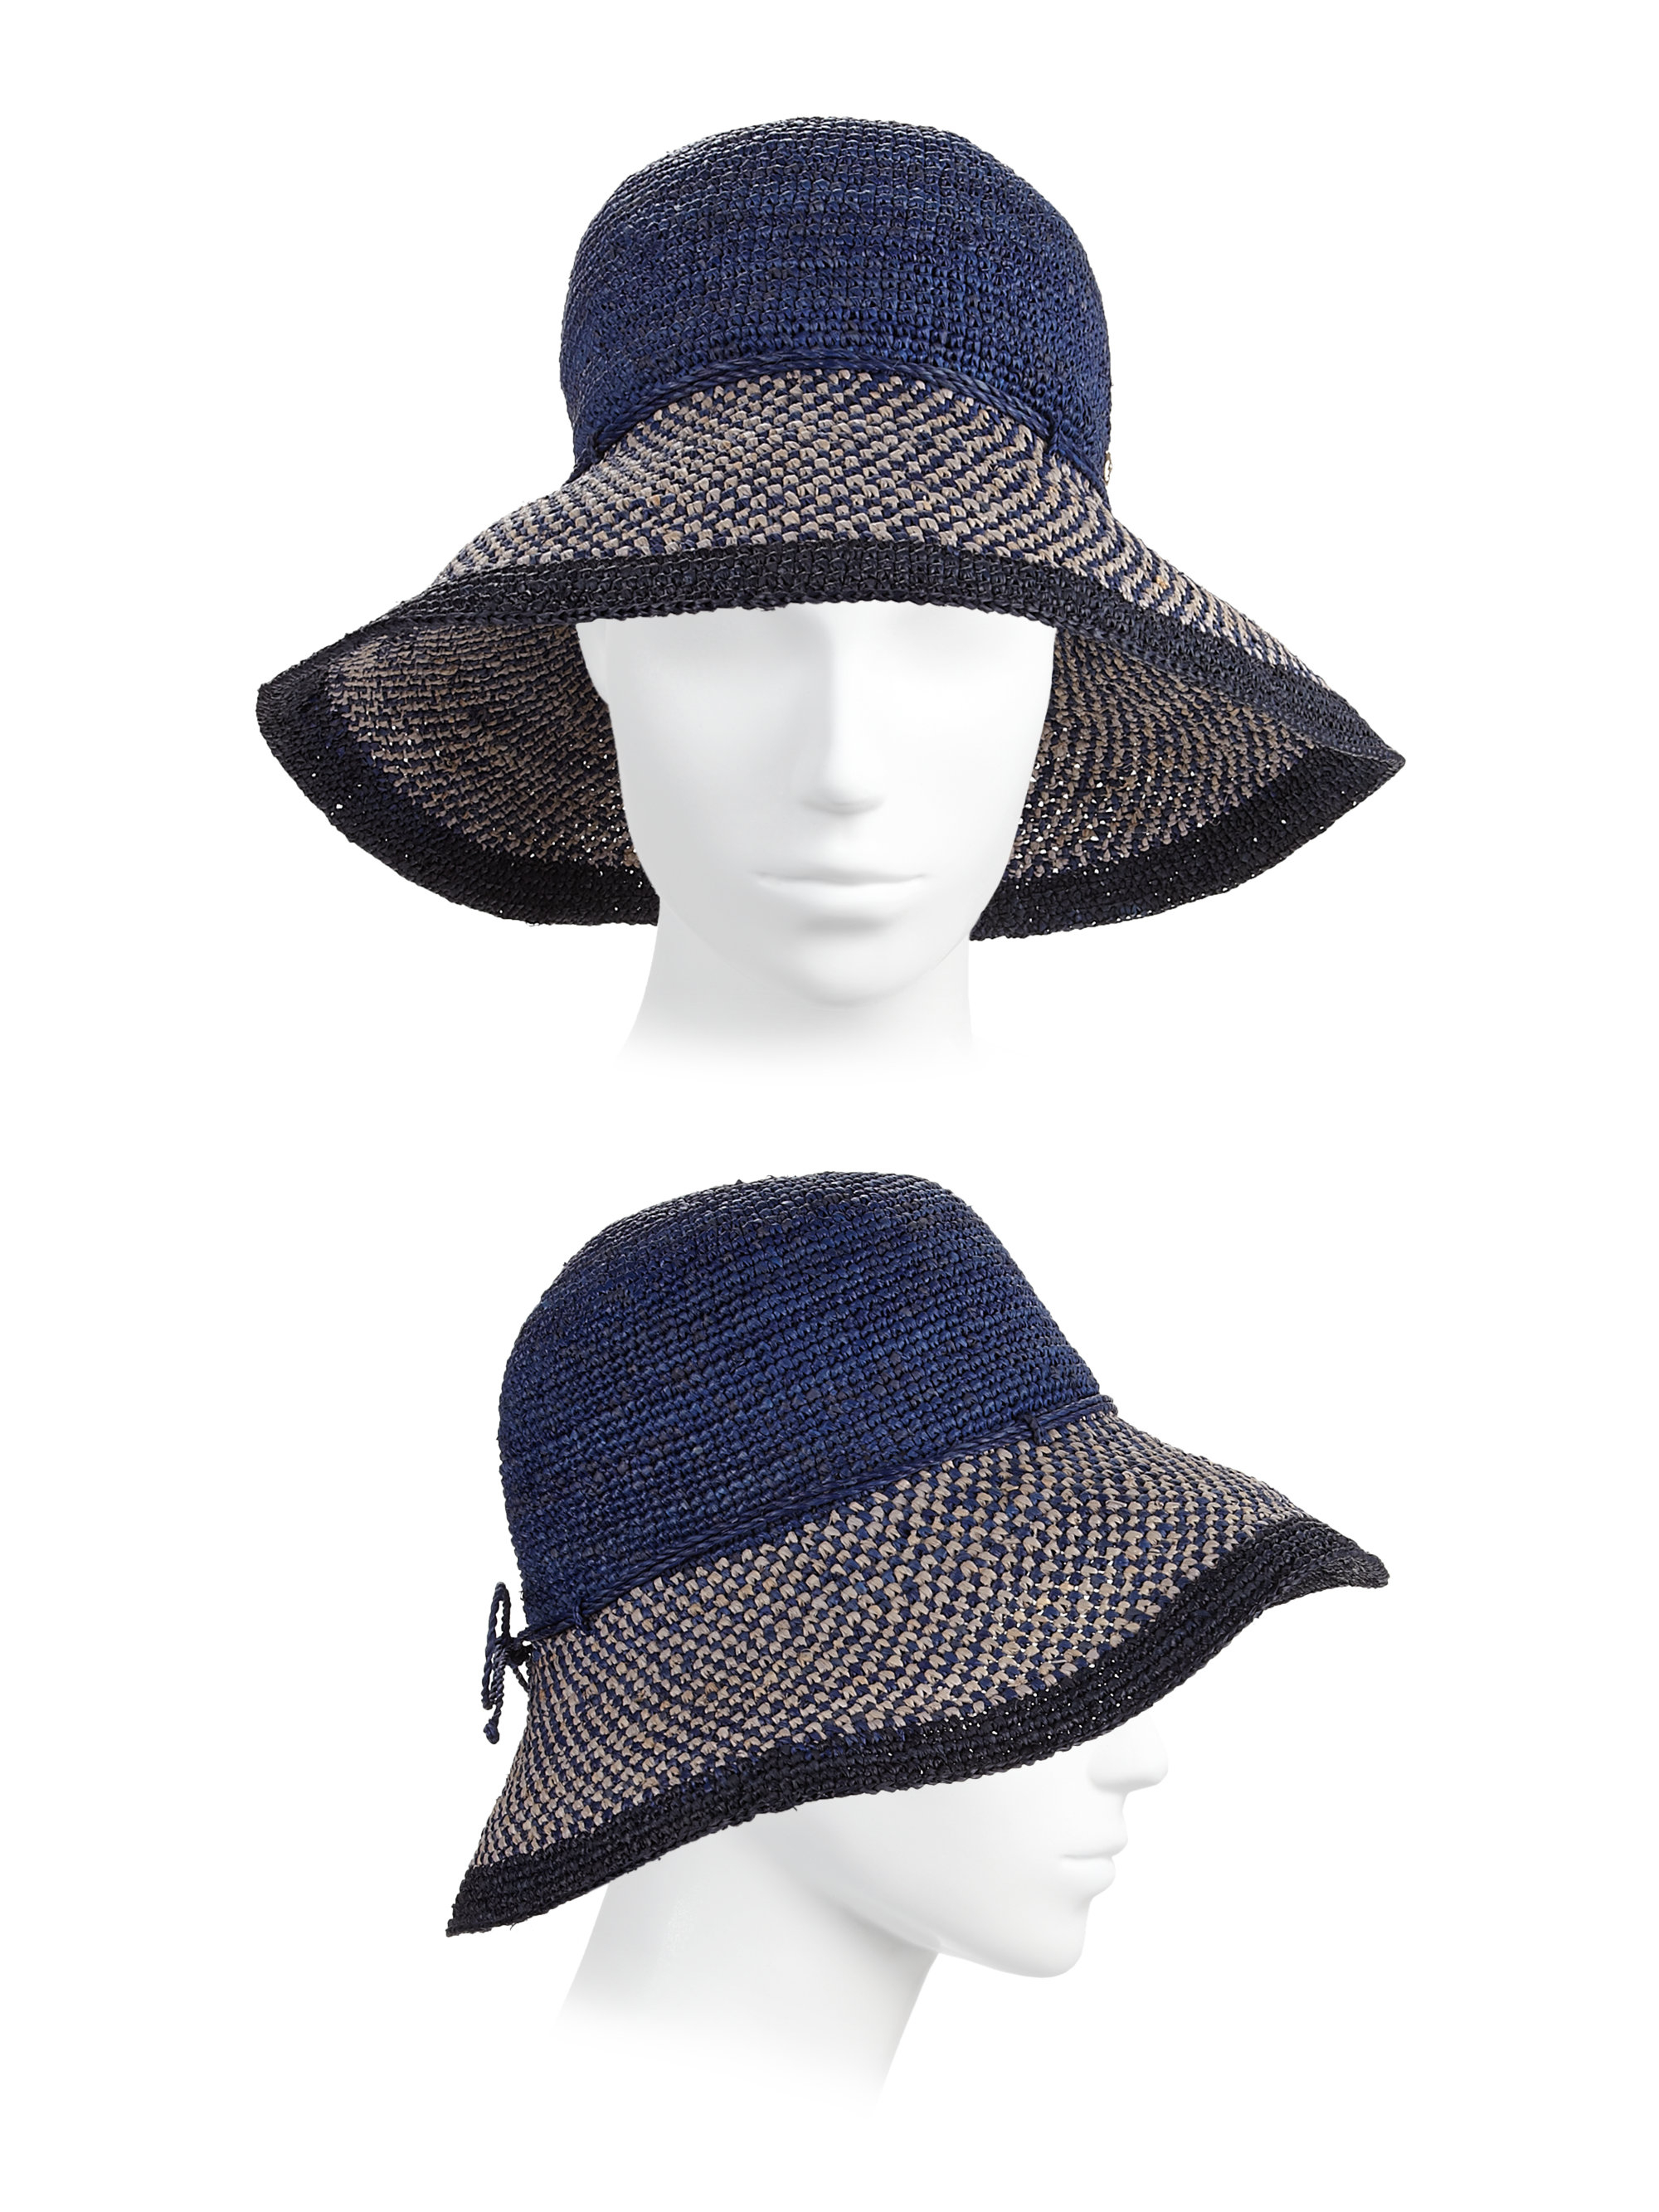 41d0d0da533b2 Helen Kaminski Provence 10 Raffia Sun Hat in Blue - Lyst